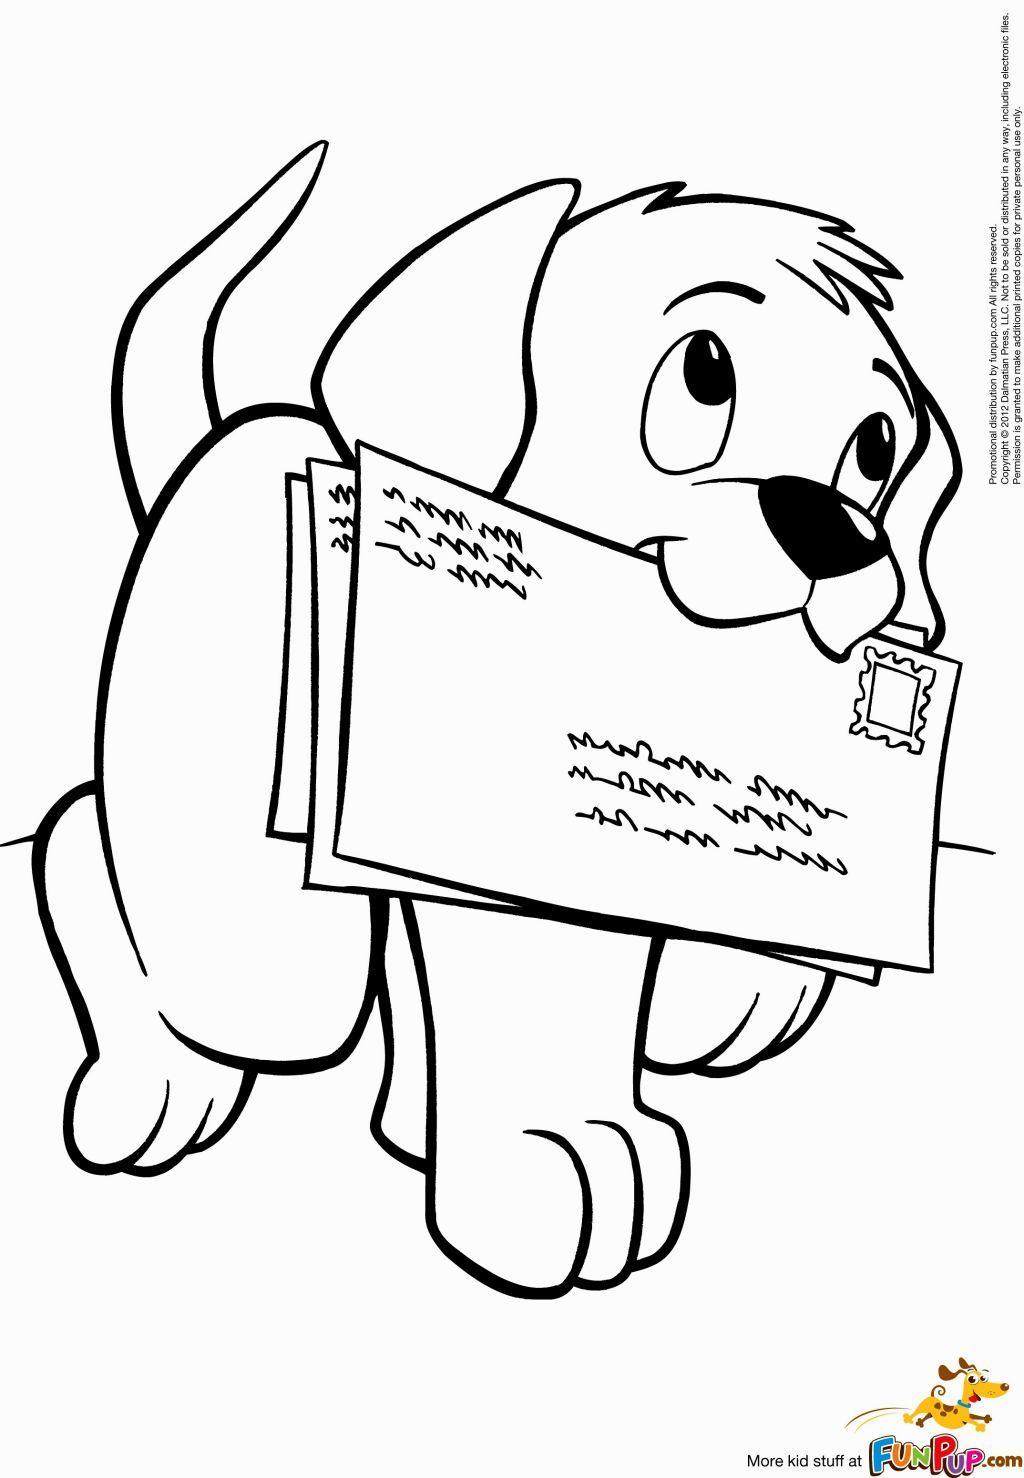 Cute Puppy Coloring Pages Puppy Coloring Pages Animal Coloring Books Cute Coloring Pages